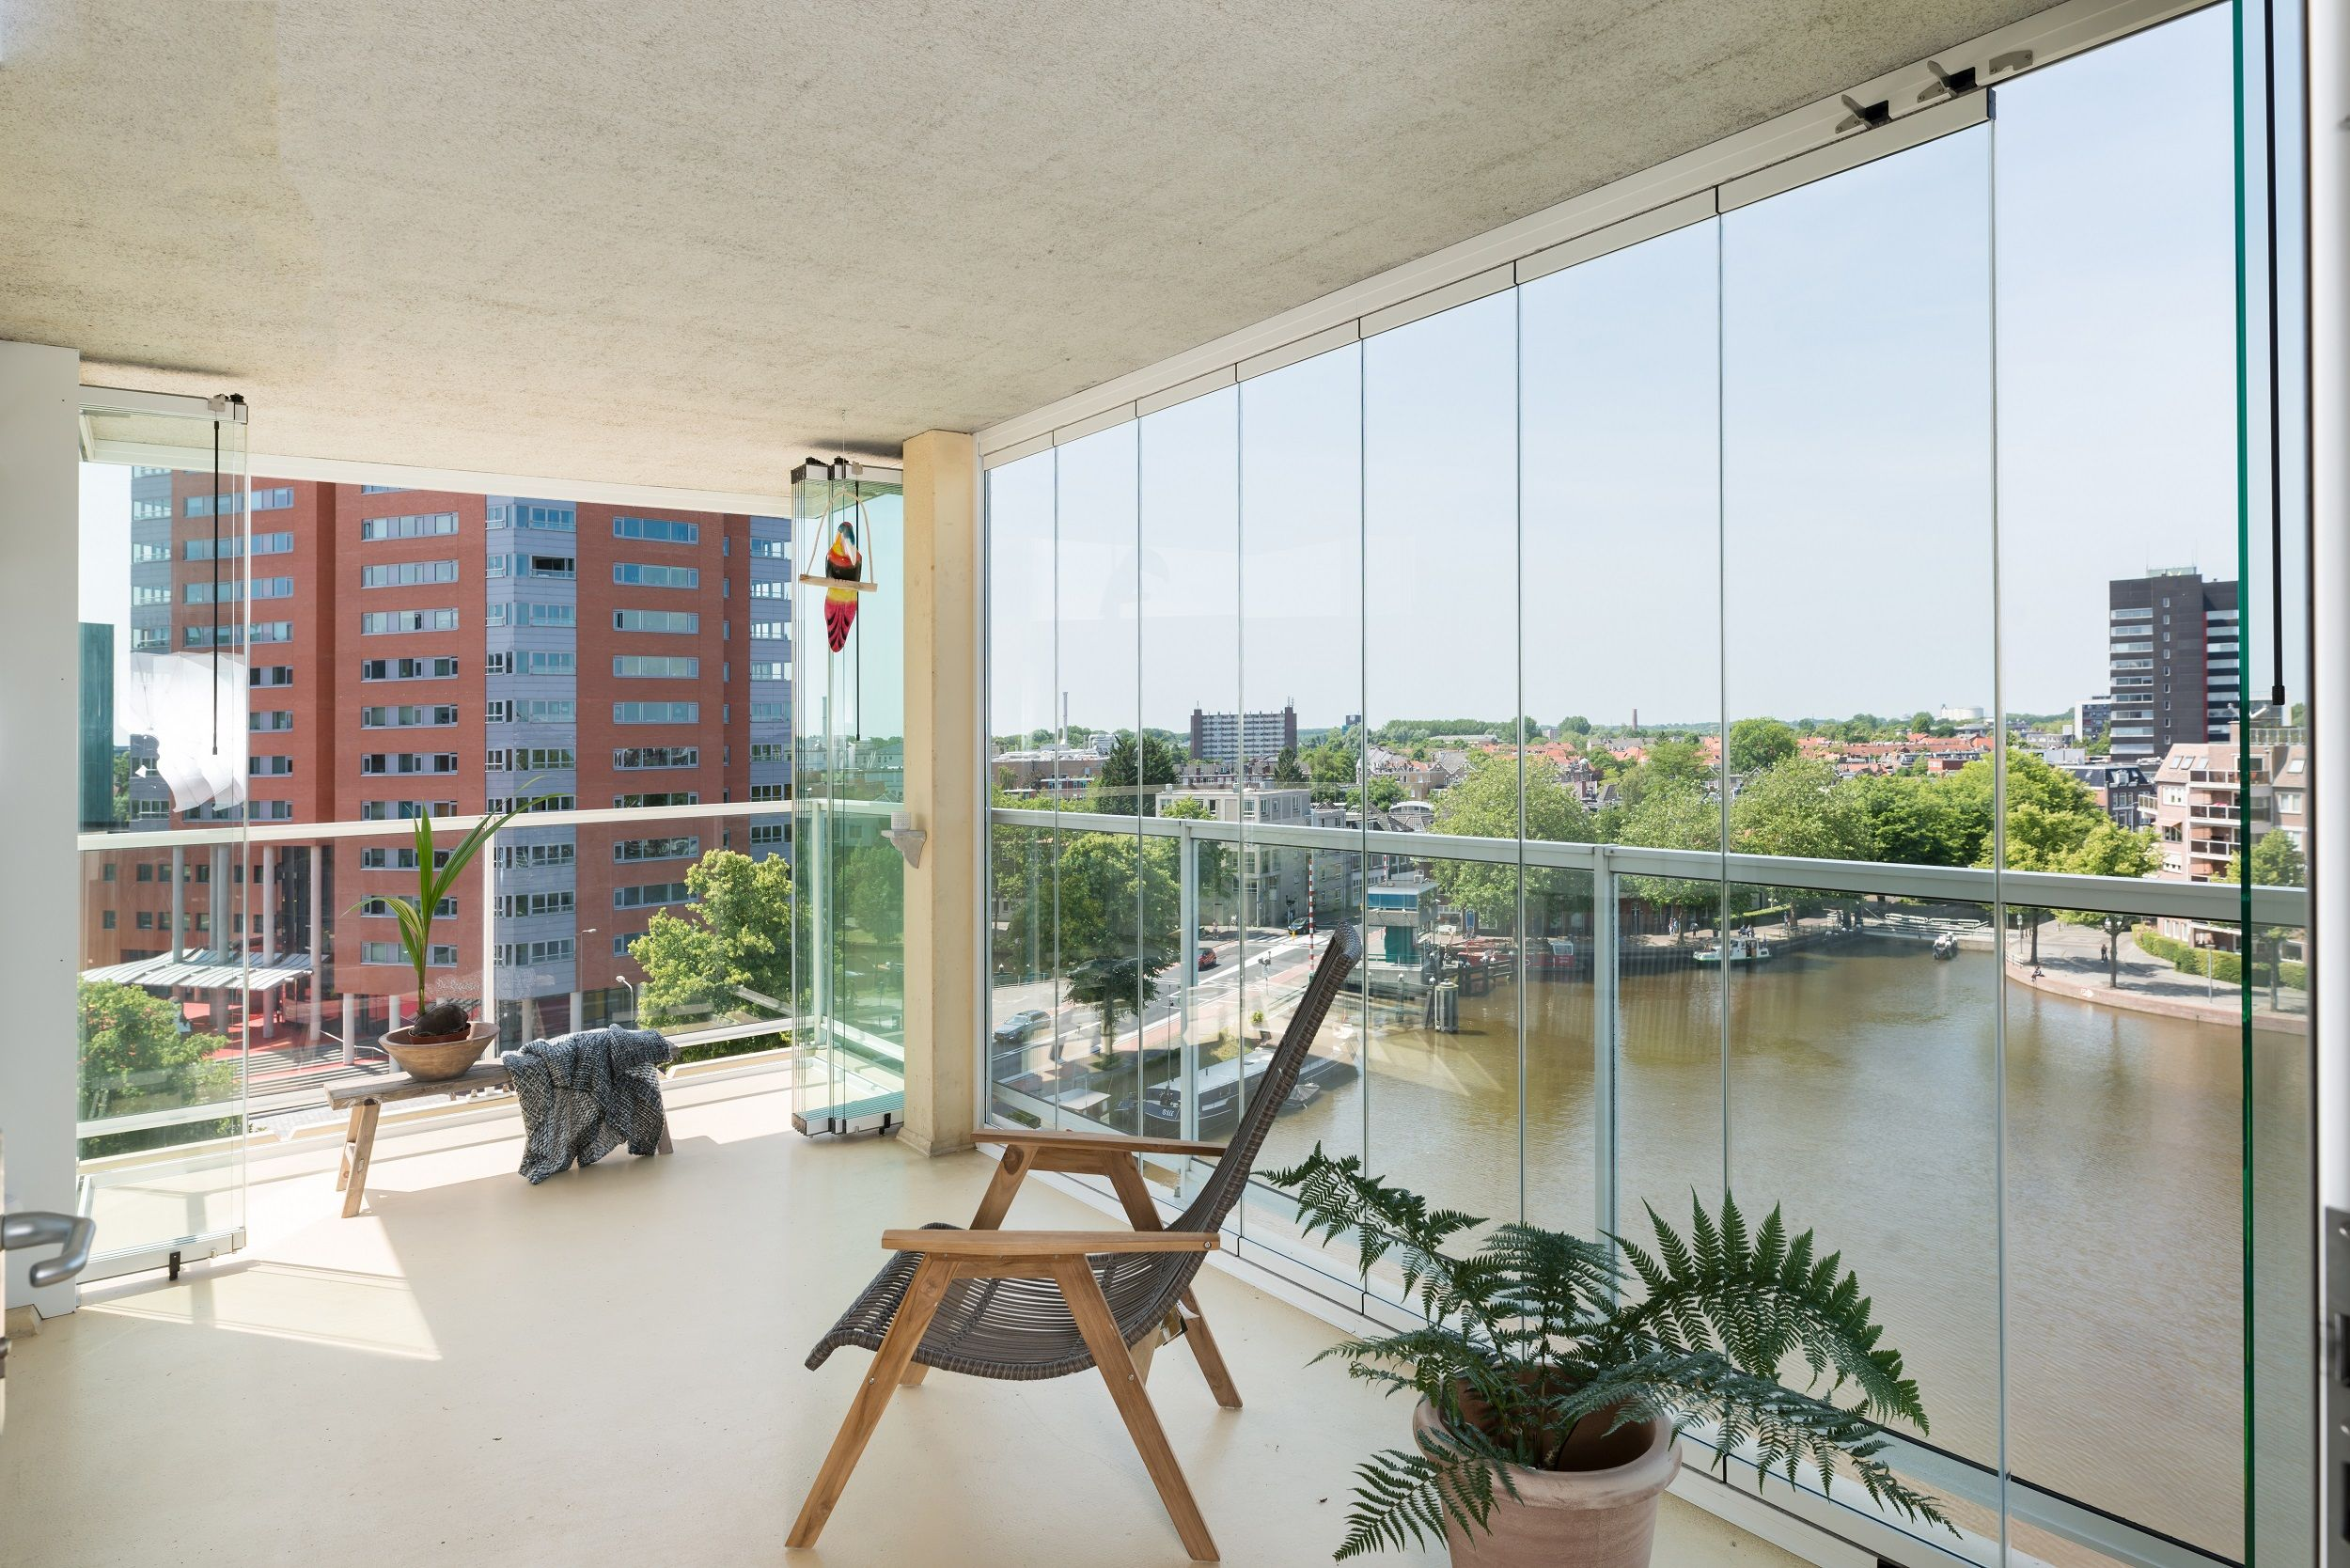 Balkonkamers groningen metalura ◯ balkonkamers